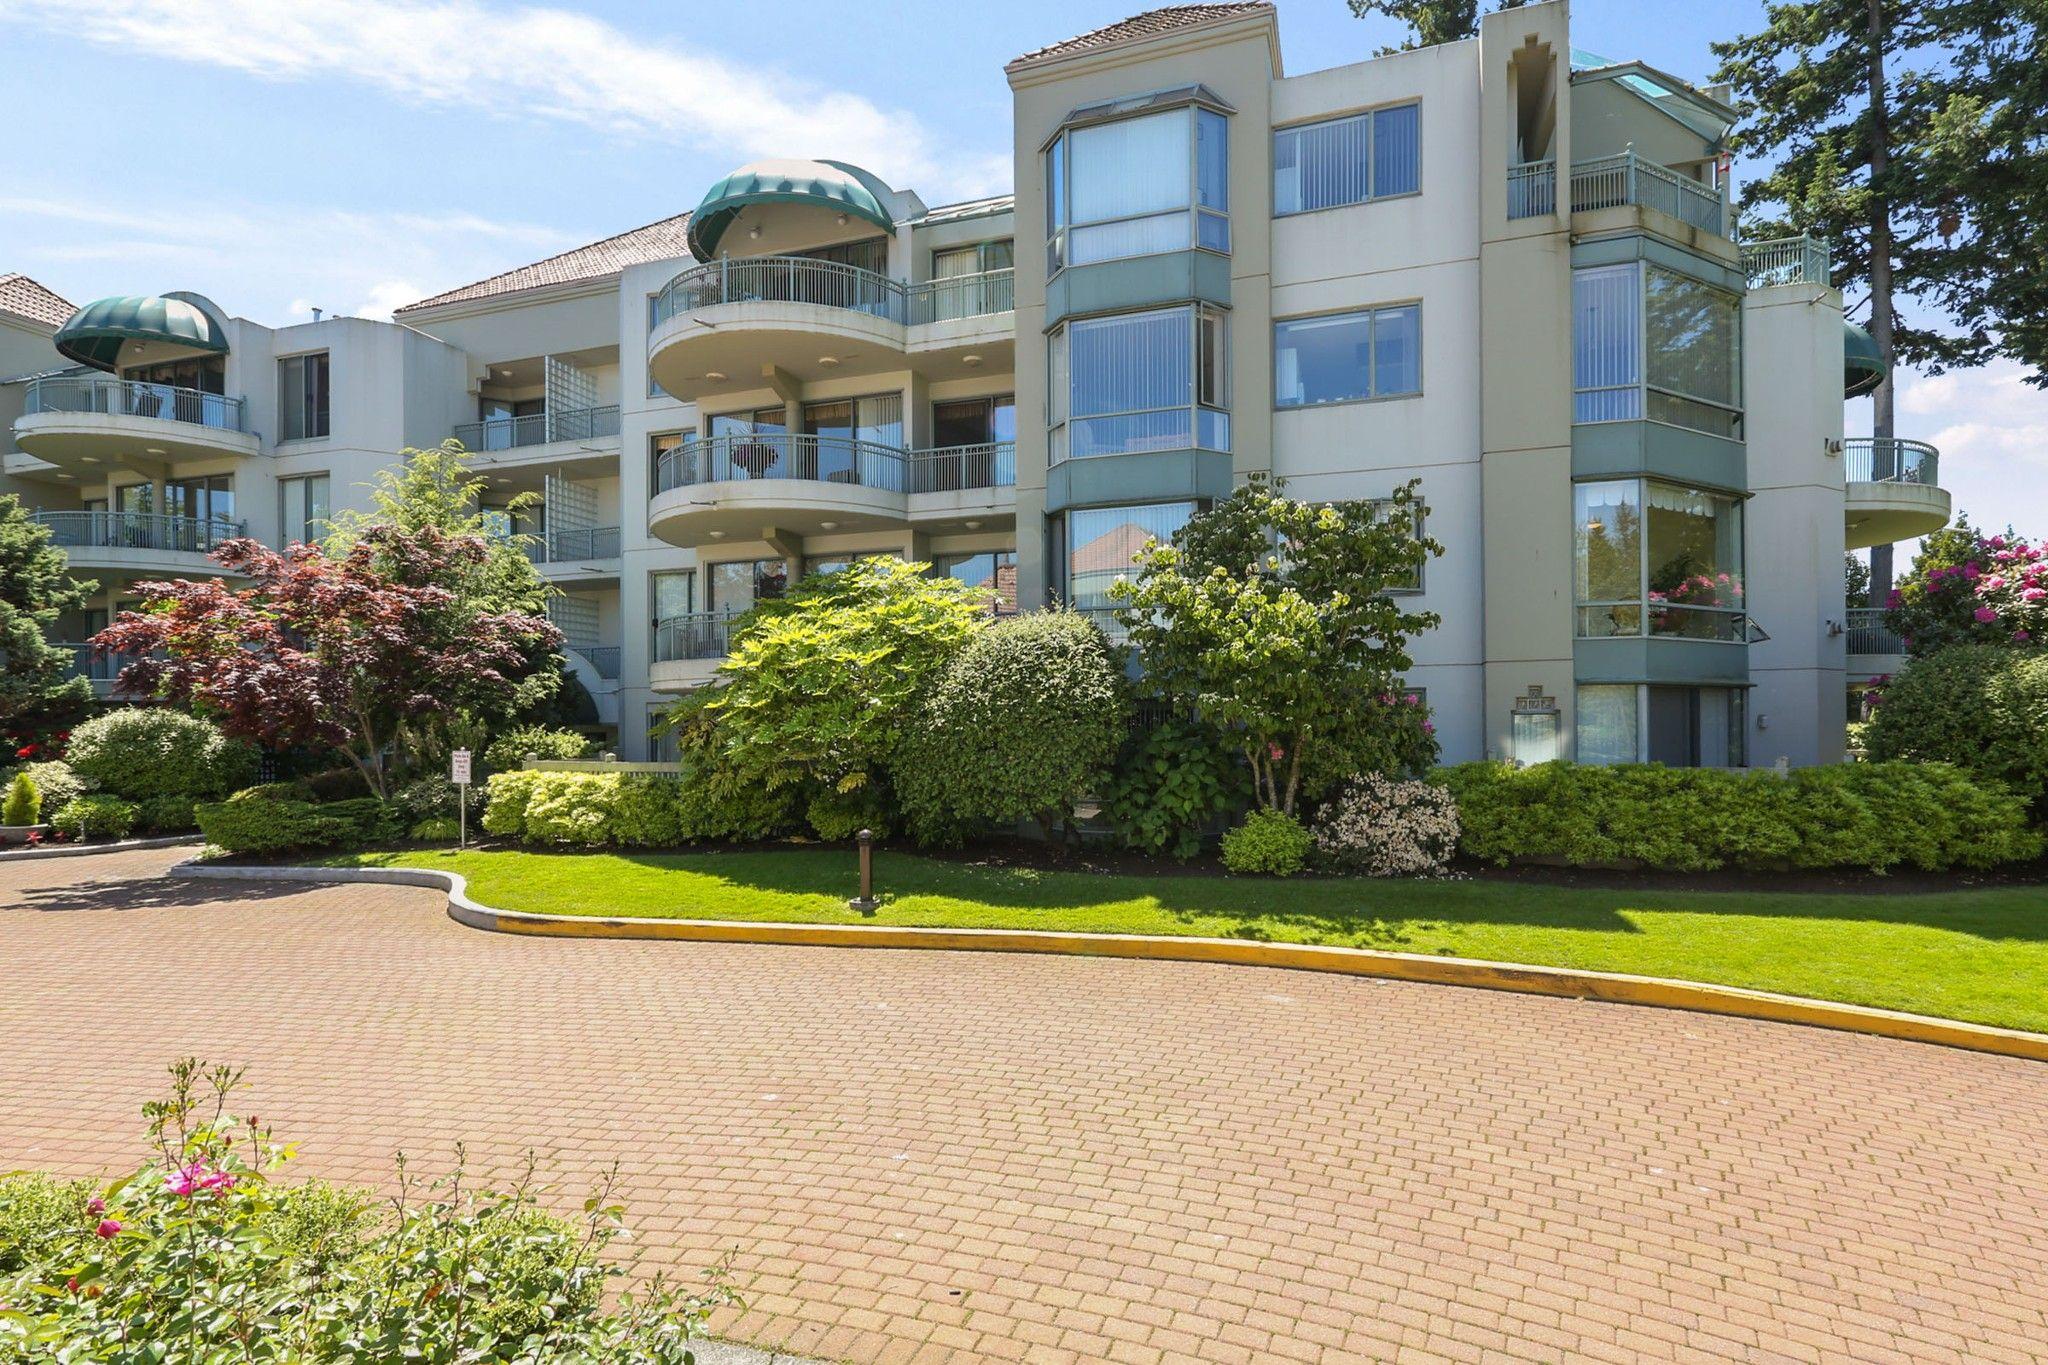 Main Photo: 206 1725 MARTIN Drive in Surrey: Sunnyside Park Surrey Condo for sale (South Surrey White Rock)  : MLS®# R2604978